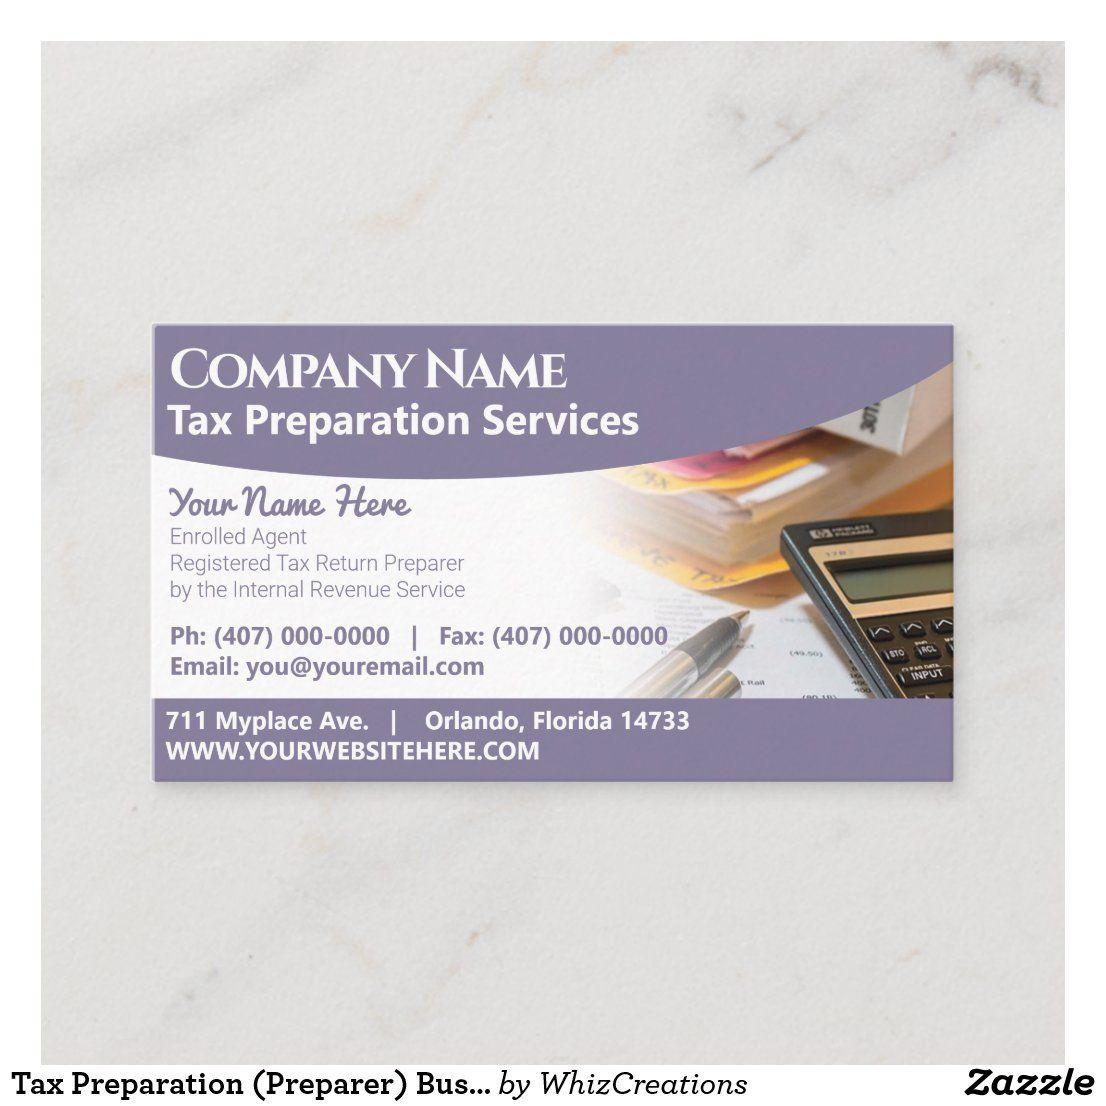 Tax Preparation Preparer Business Card Zazzle Com Tax Preparation Tax Preparation Services Tax Prep